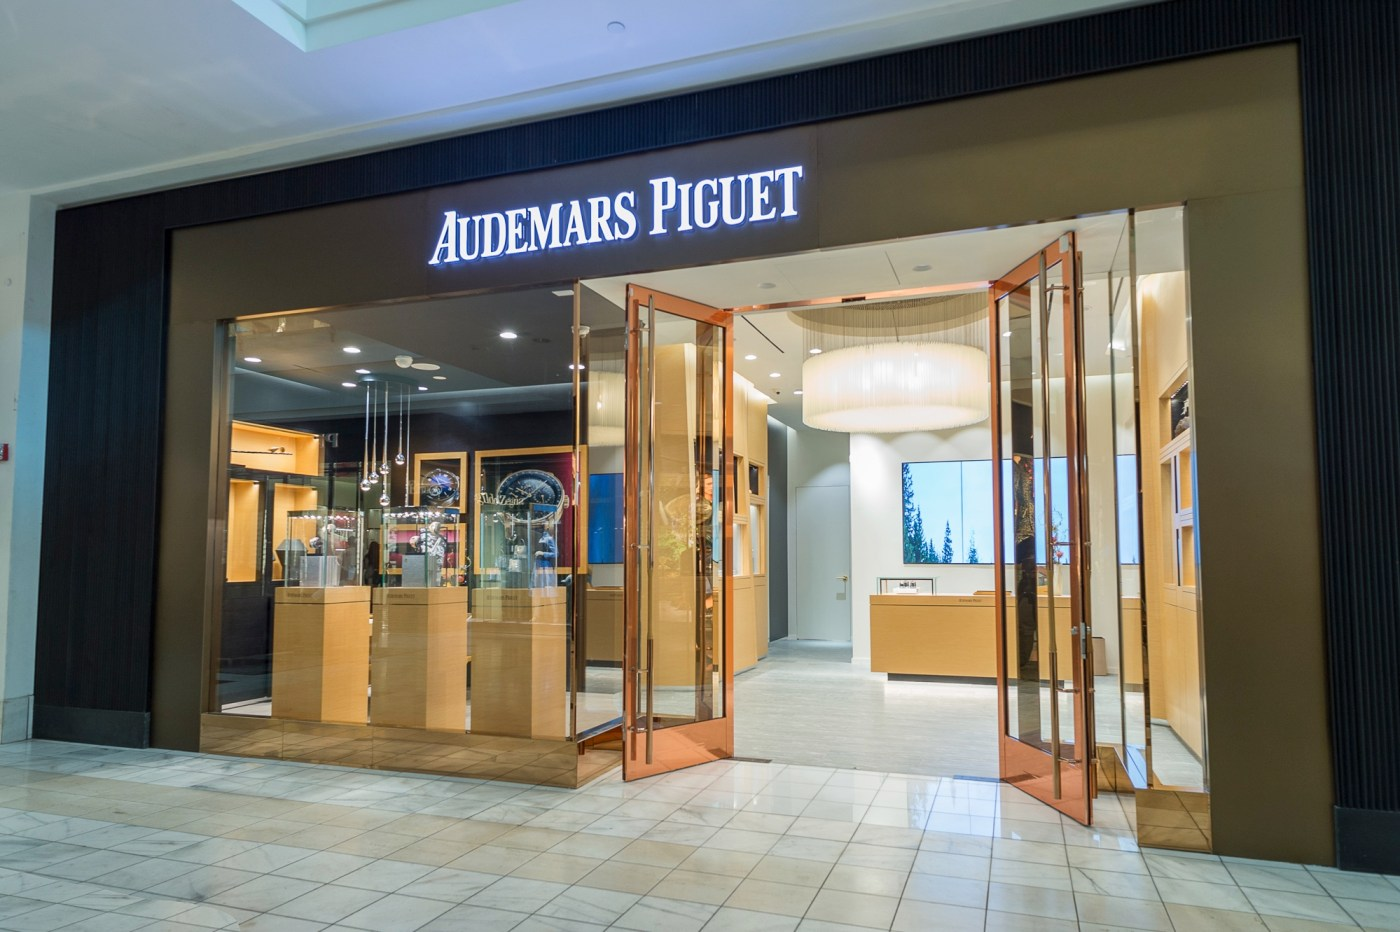 Audemars Piguet WOS Atlana storefront